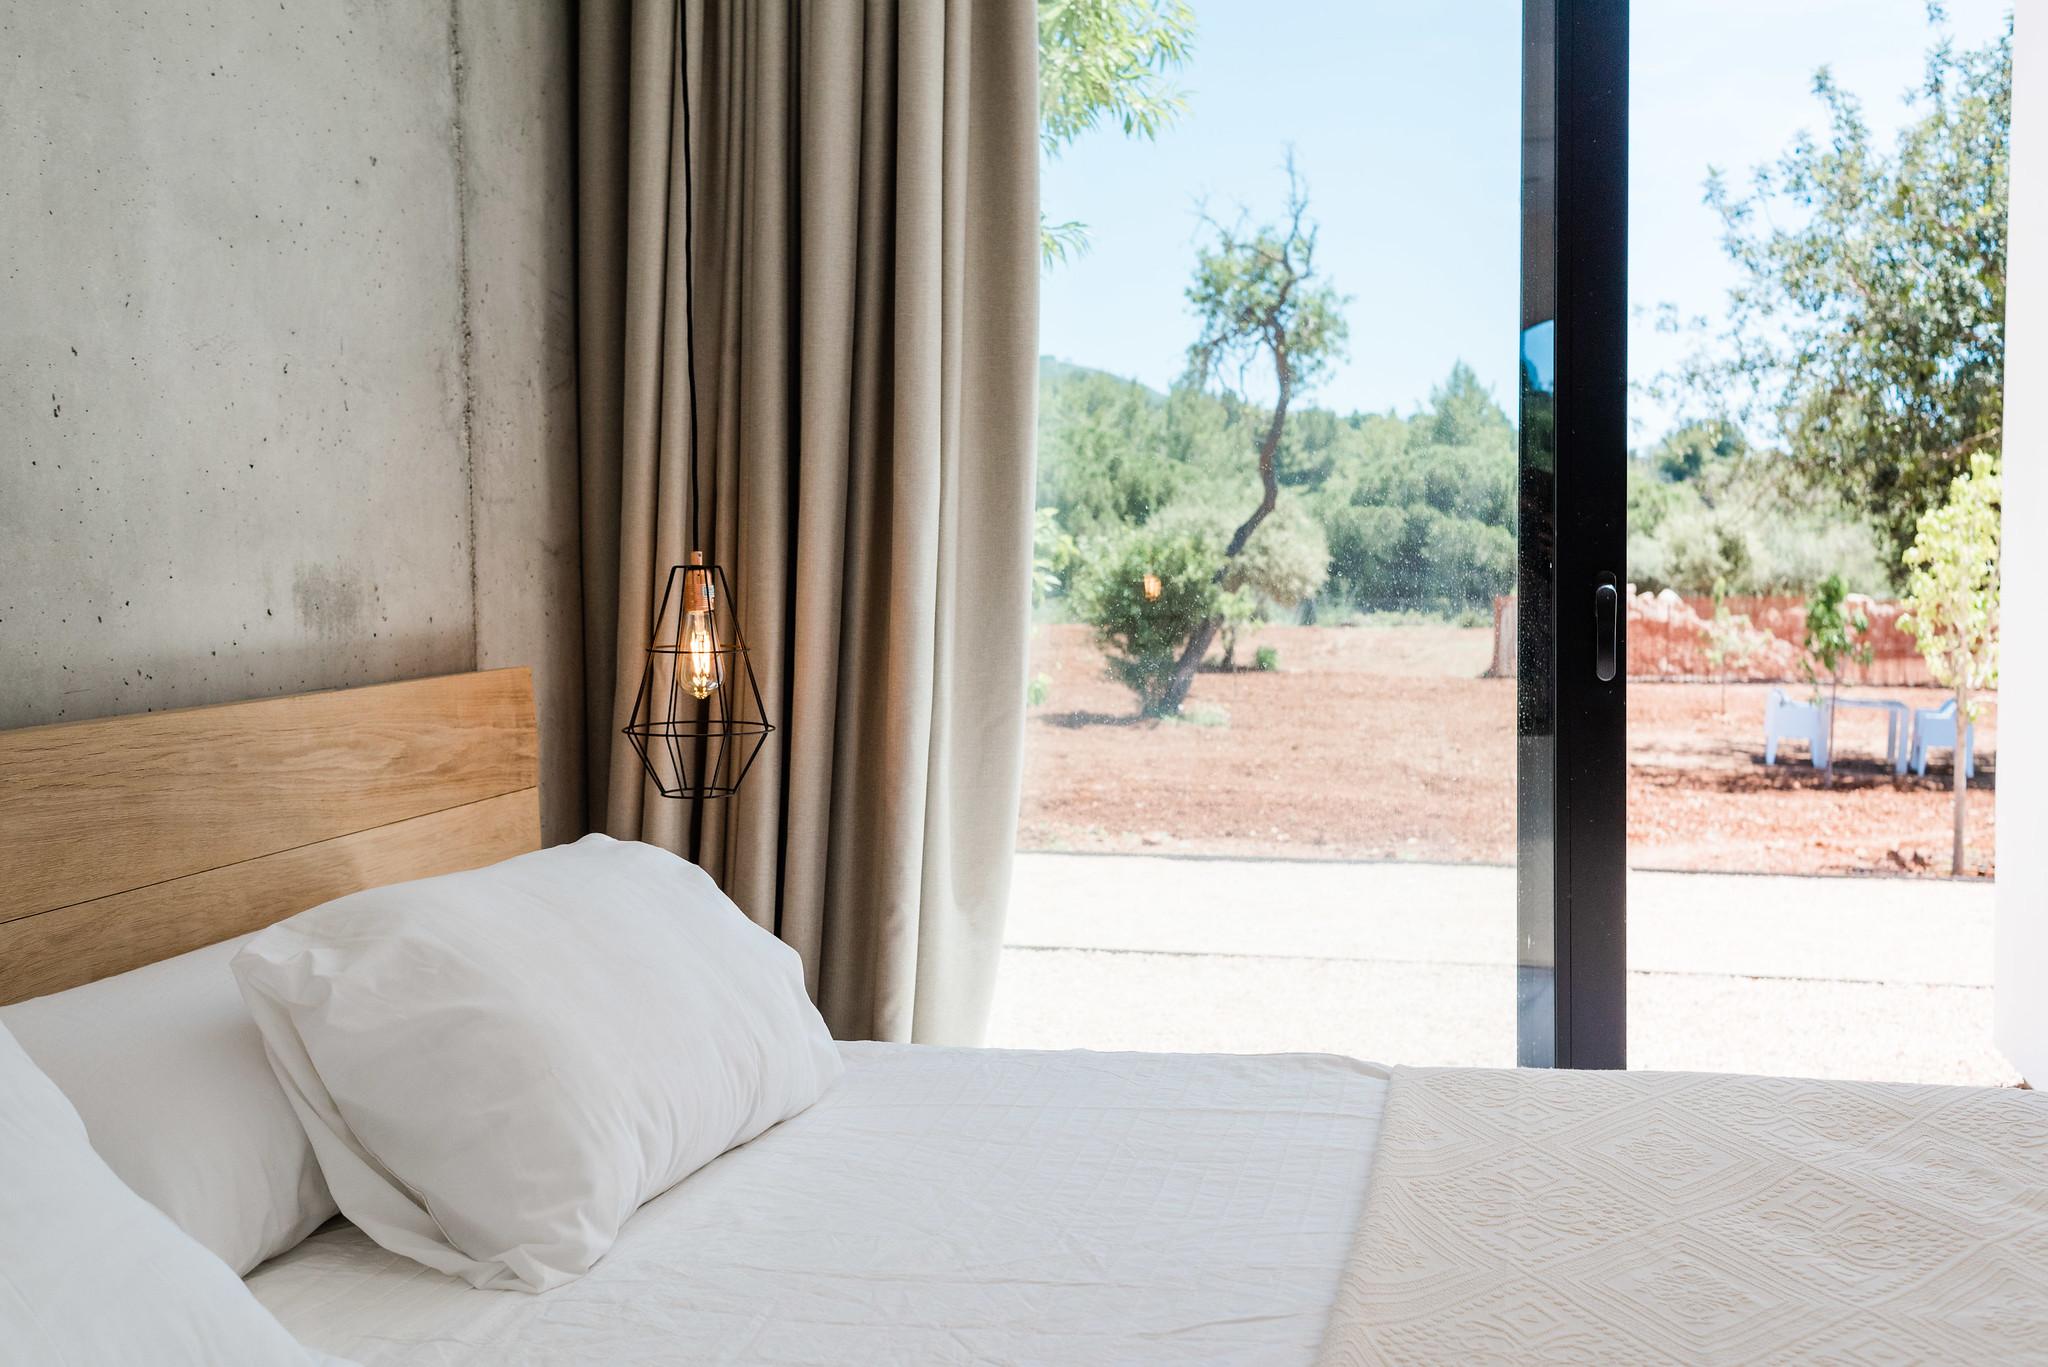 https://www.white-ibiza.com/wp-content/uploads/2020/06/white-ibiza-villas-can-carmen-interior-bedroom.jpg